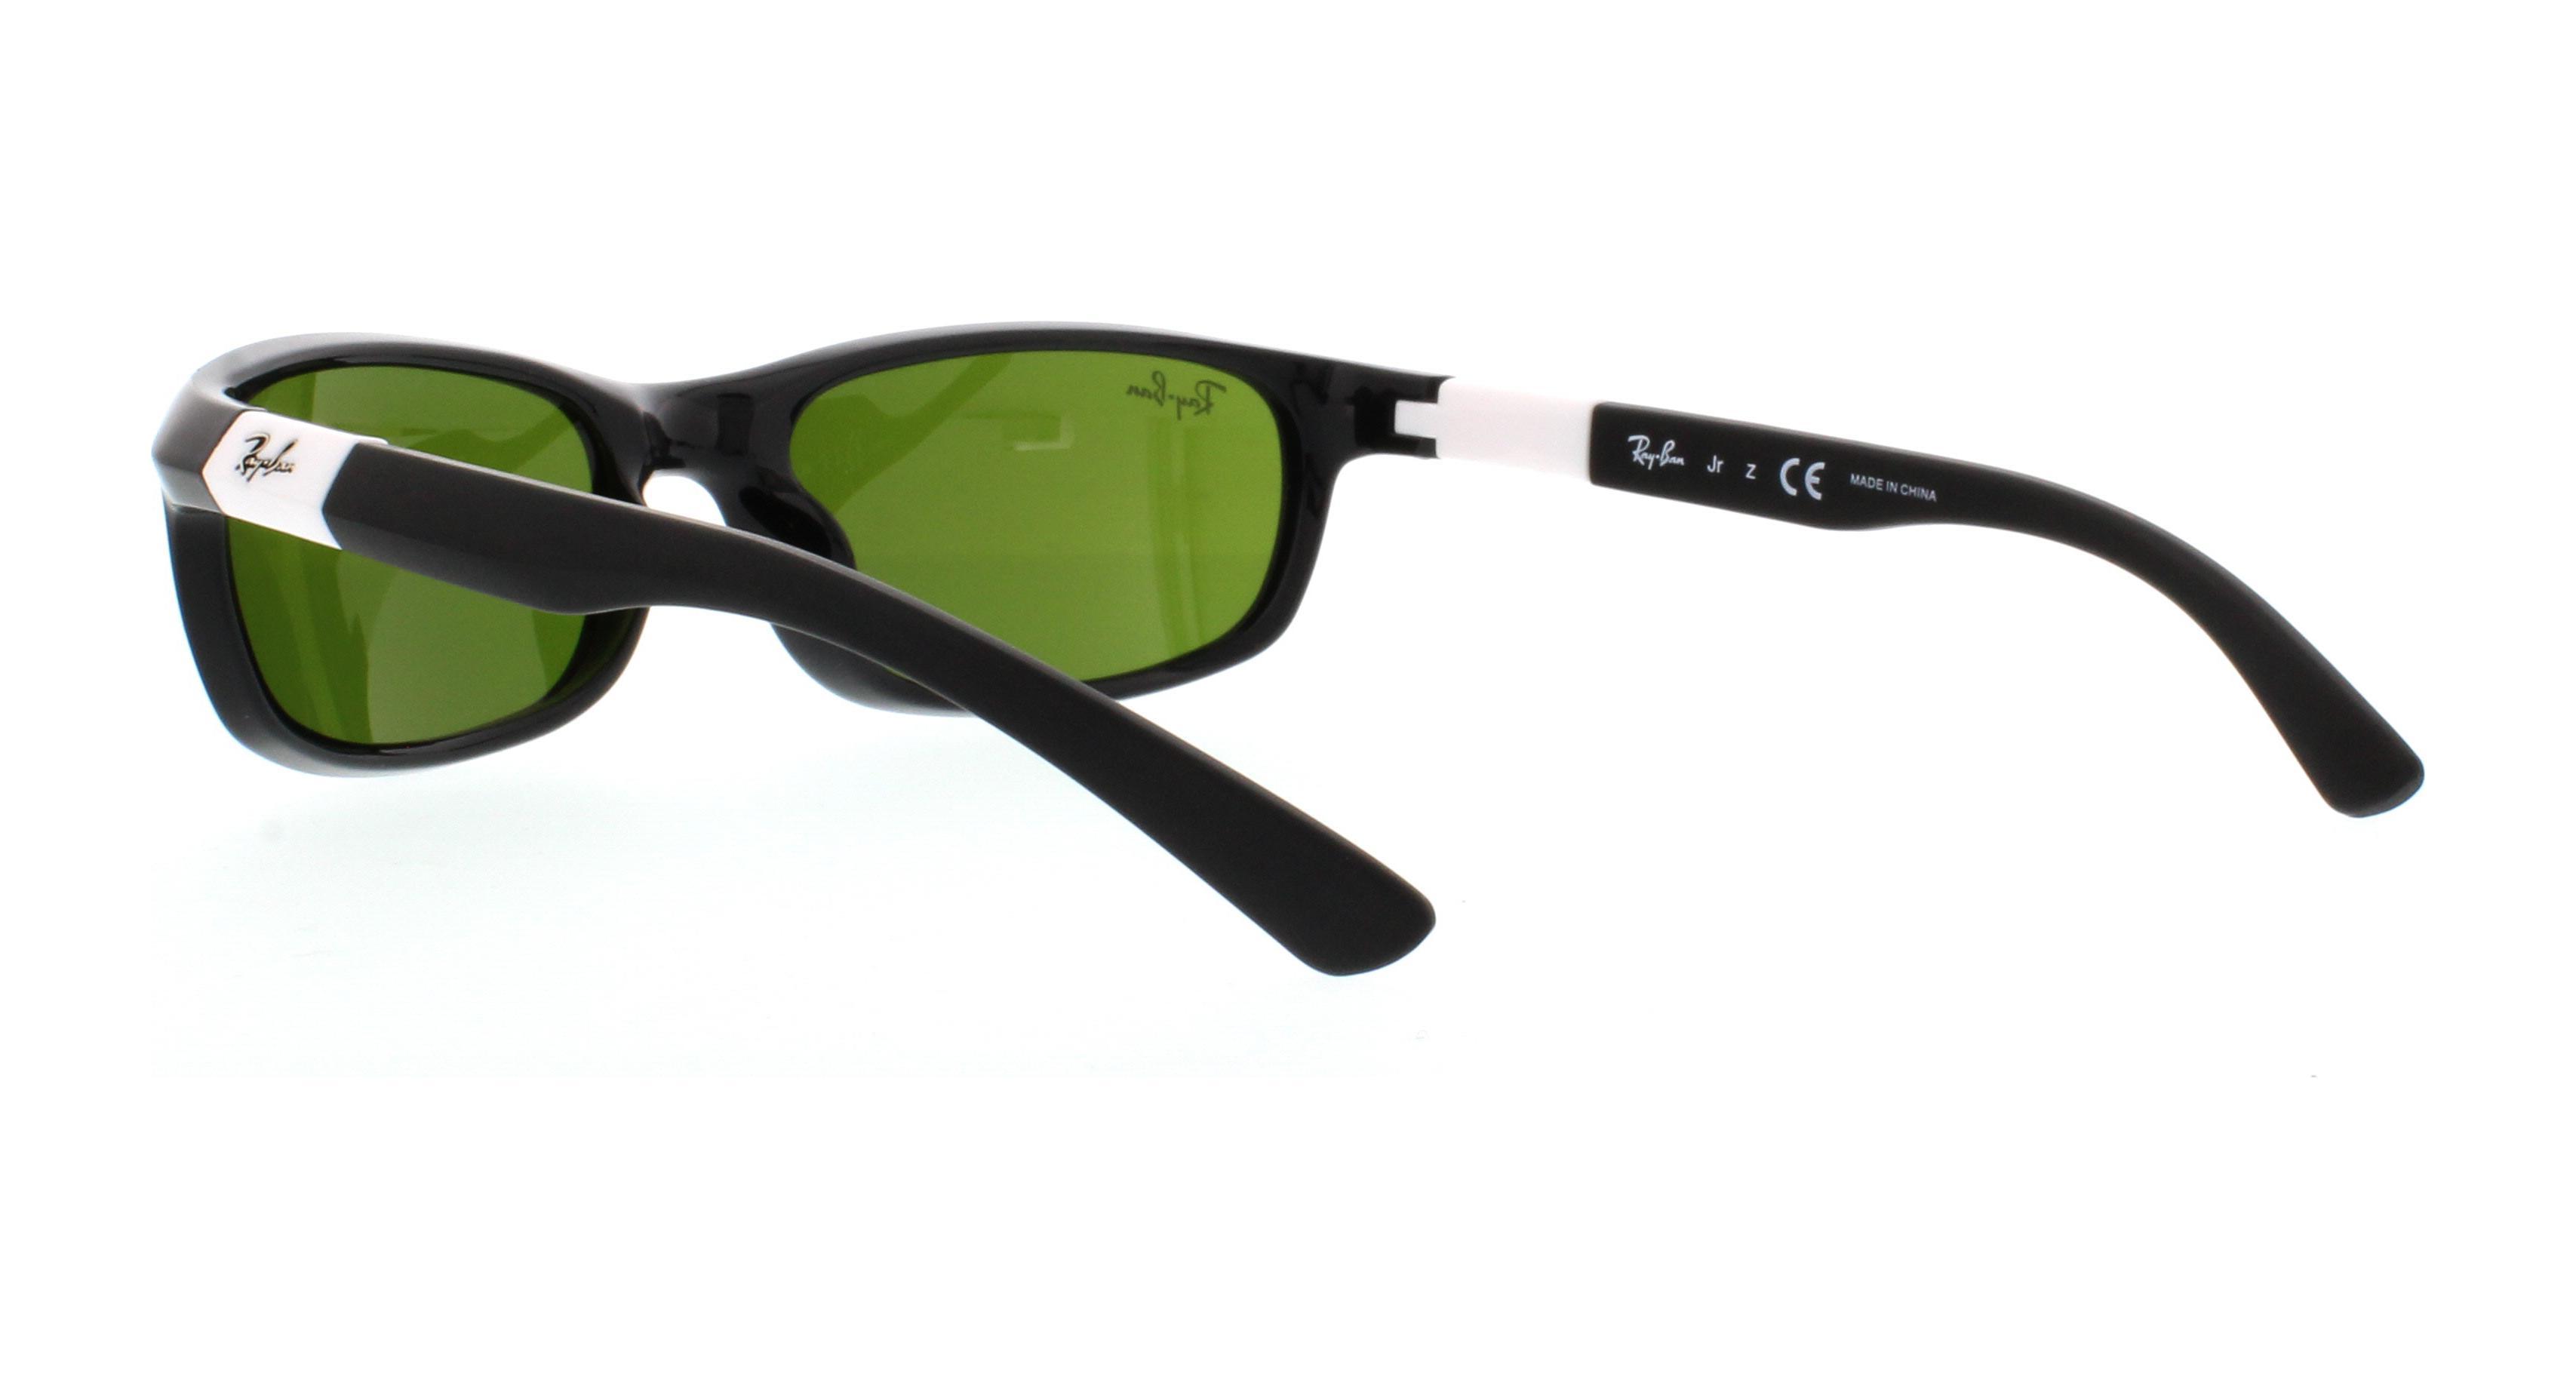 adae92de654 ... greece picture of ray ban jr sunglasses rj9056s 59f24 a5993